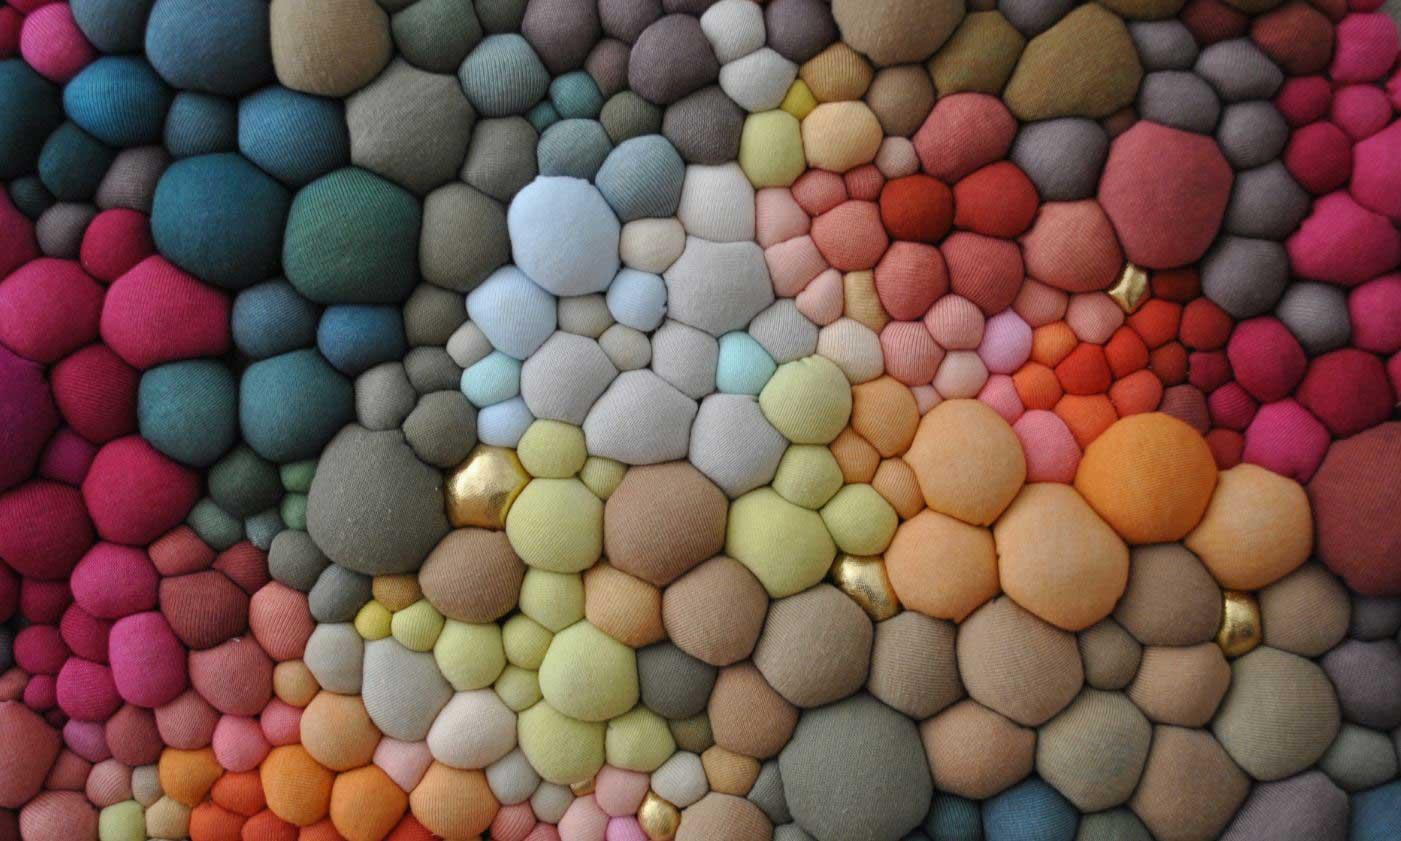 Textil Hogar Como Elegir Las Telas Para Decorar Ovacen - Imagenes-para-decorar